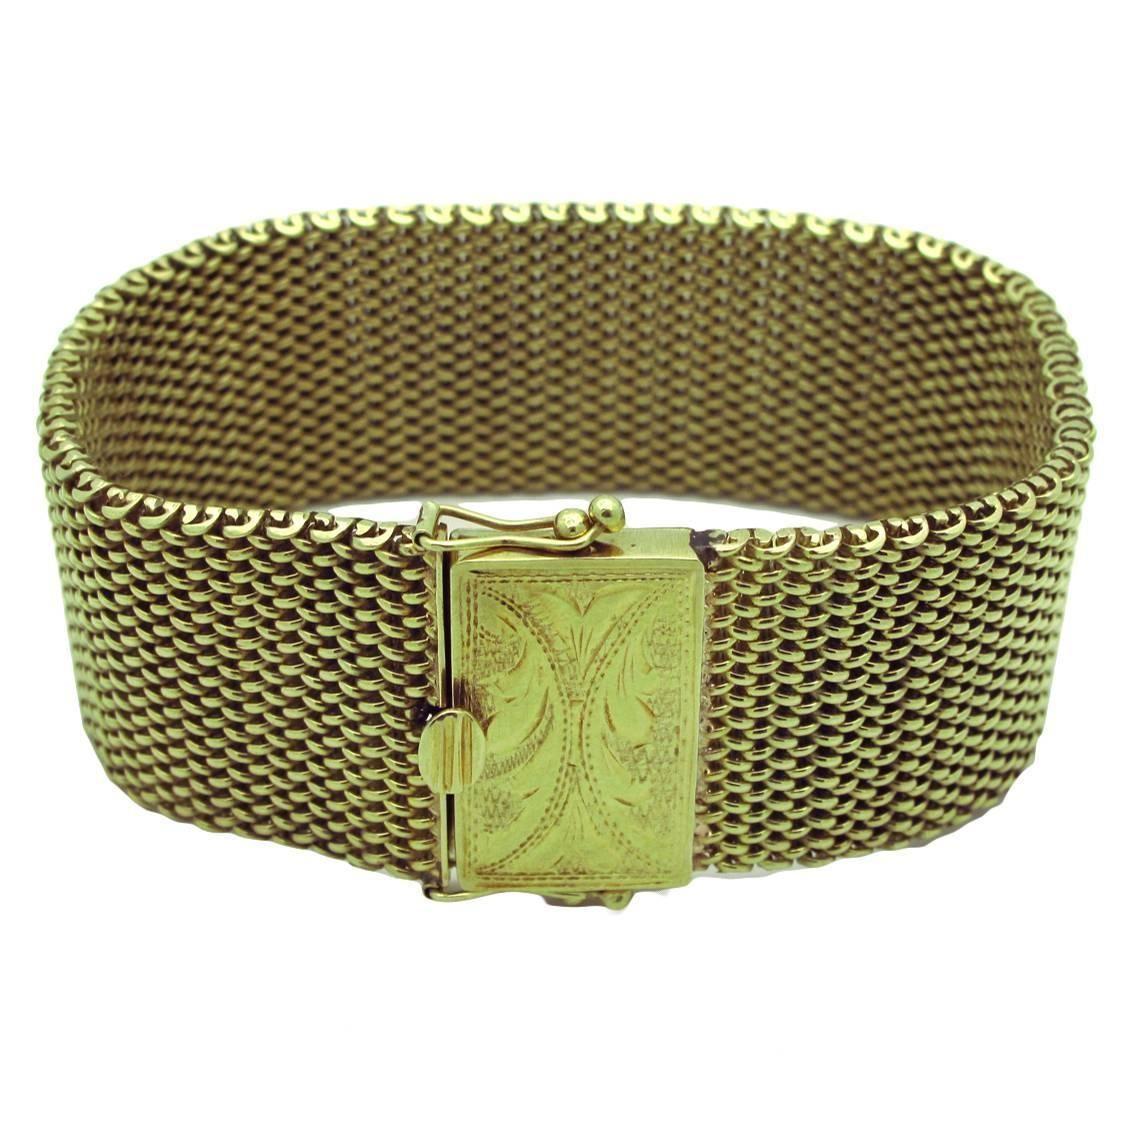 Gold Mesh Bracelet With Engraved Clasp Mesh bracelet